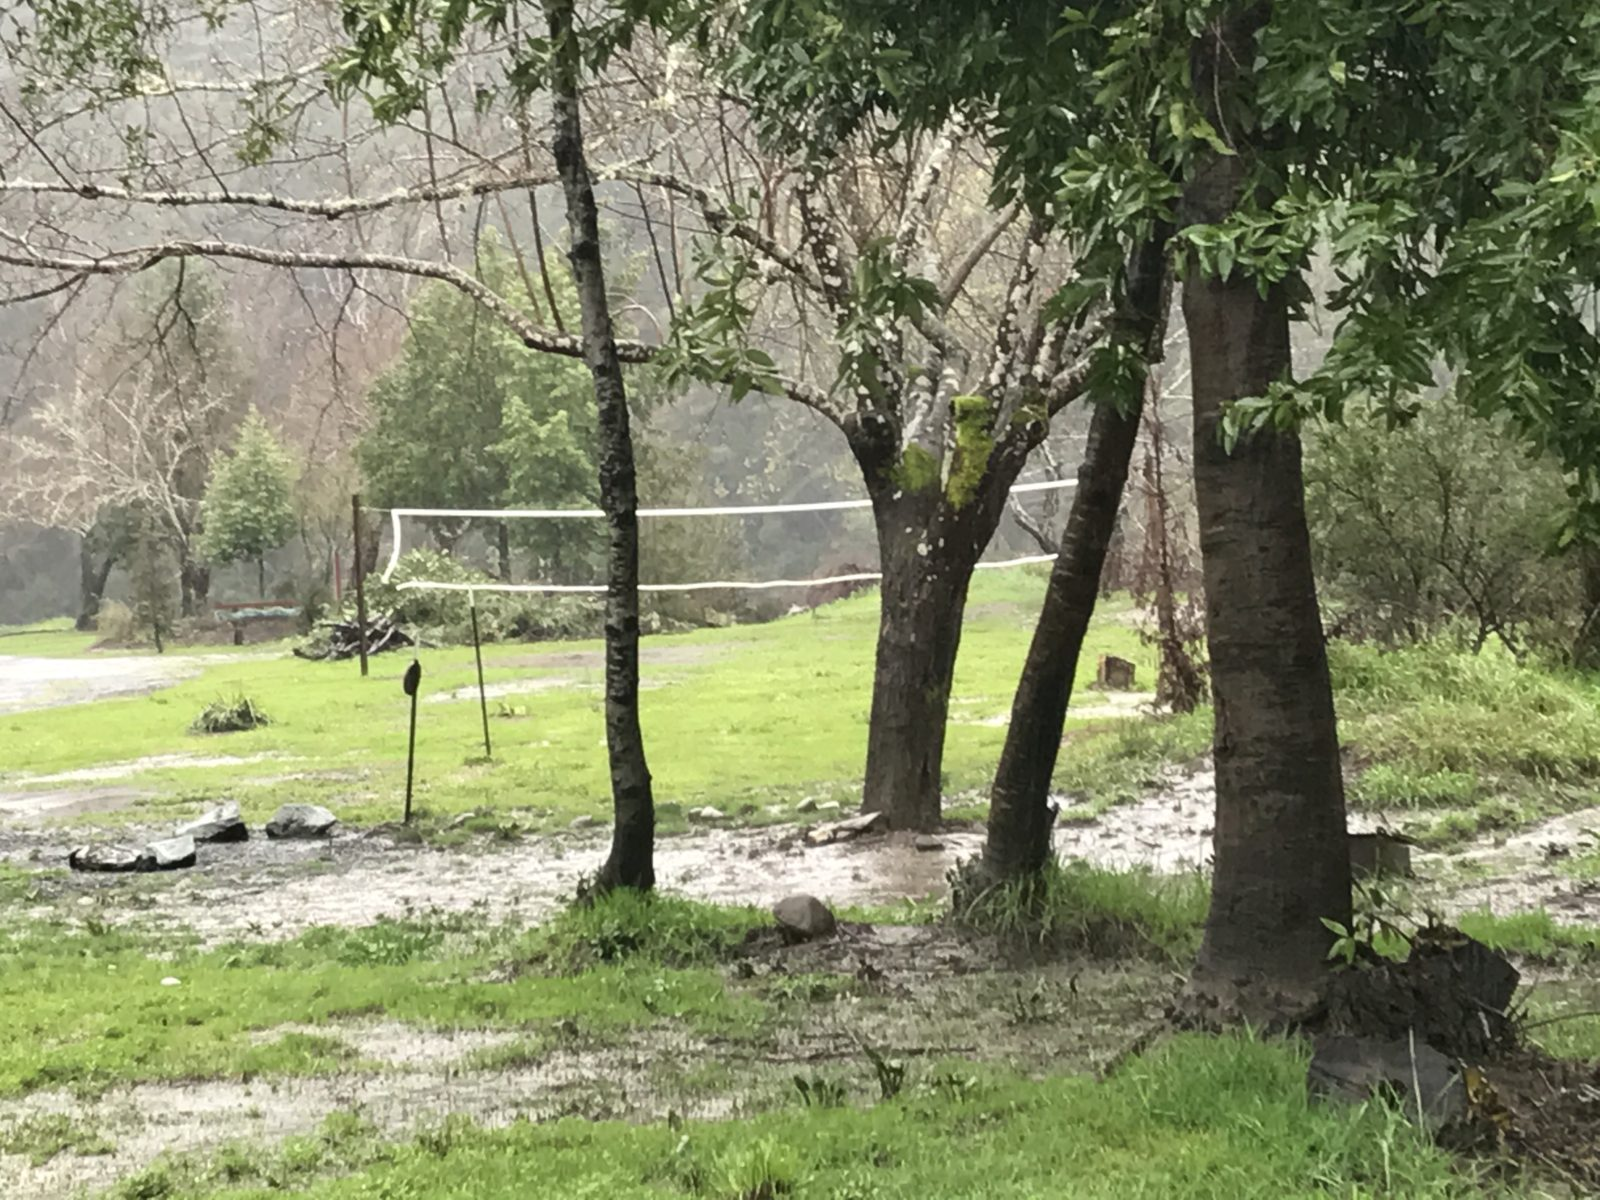 Muddy RV park